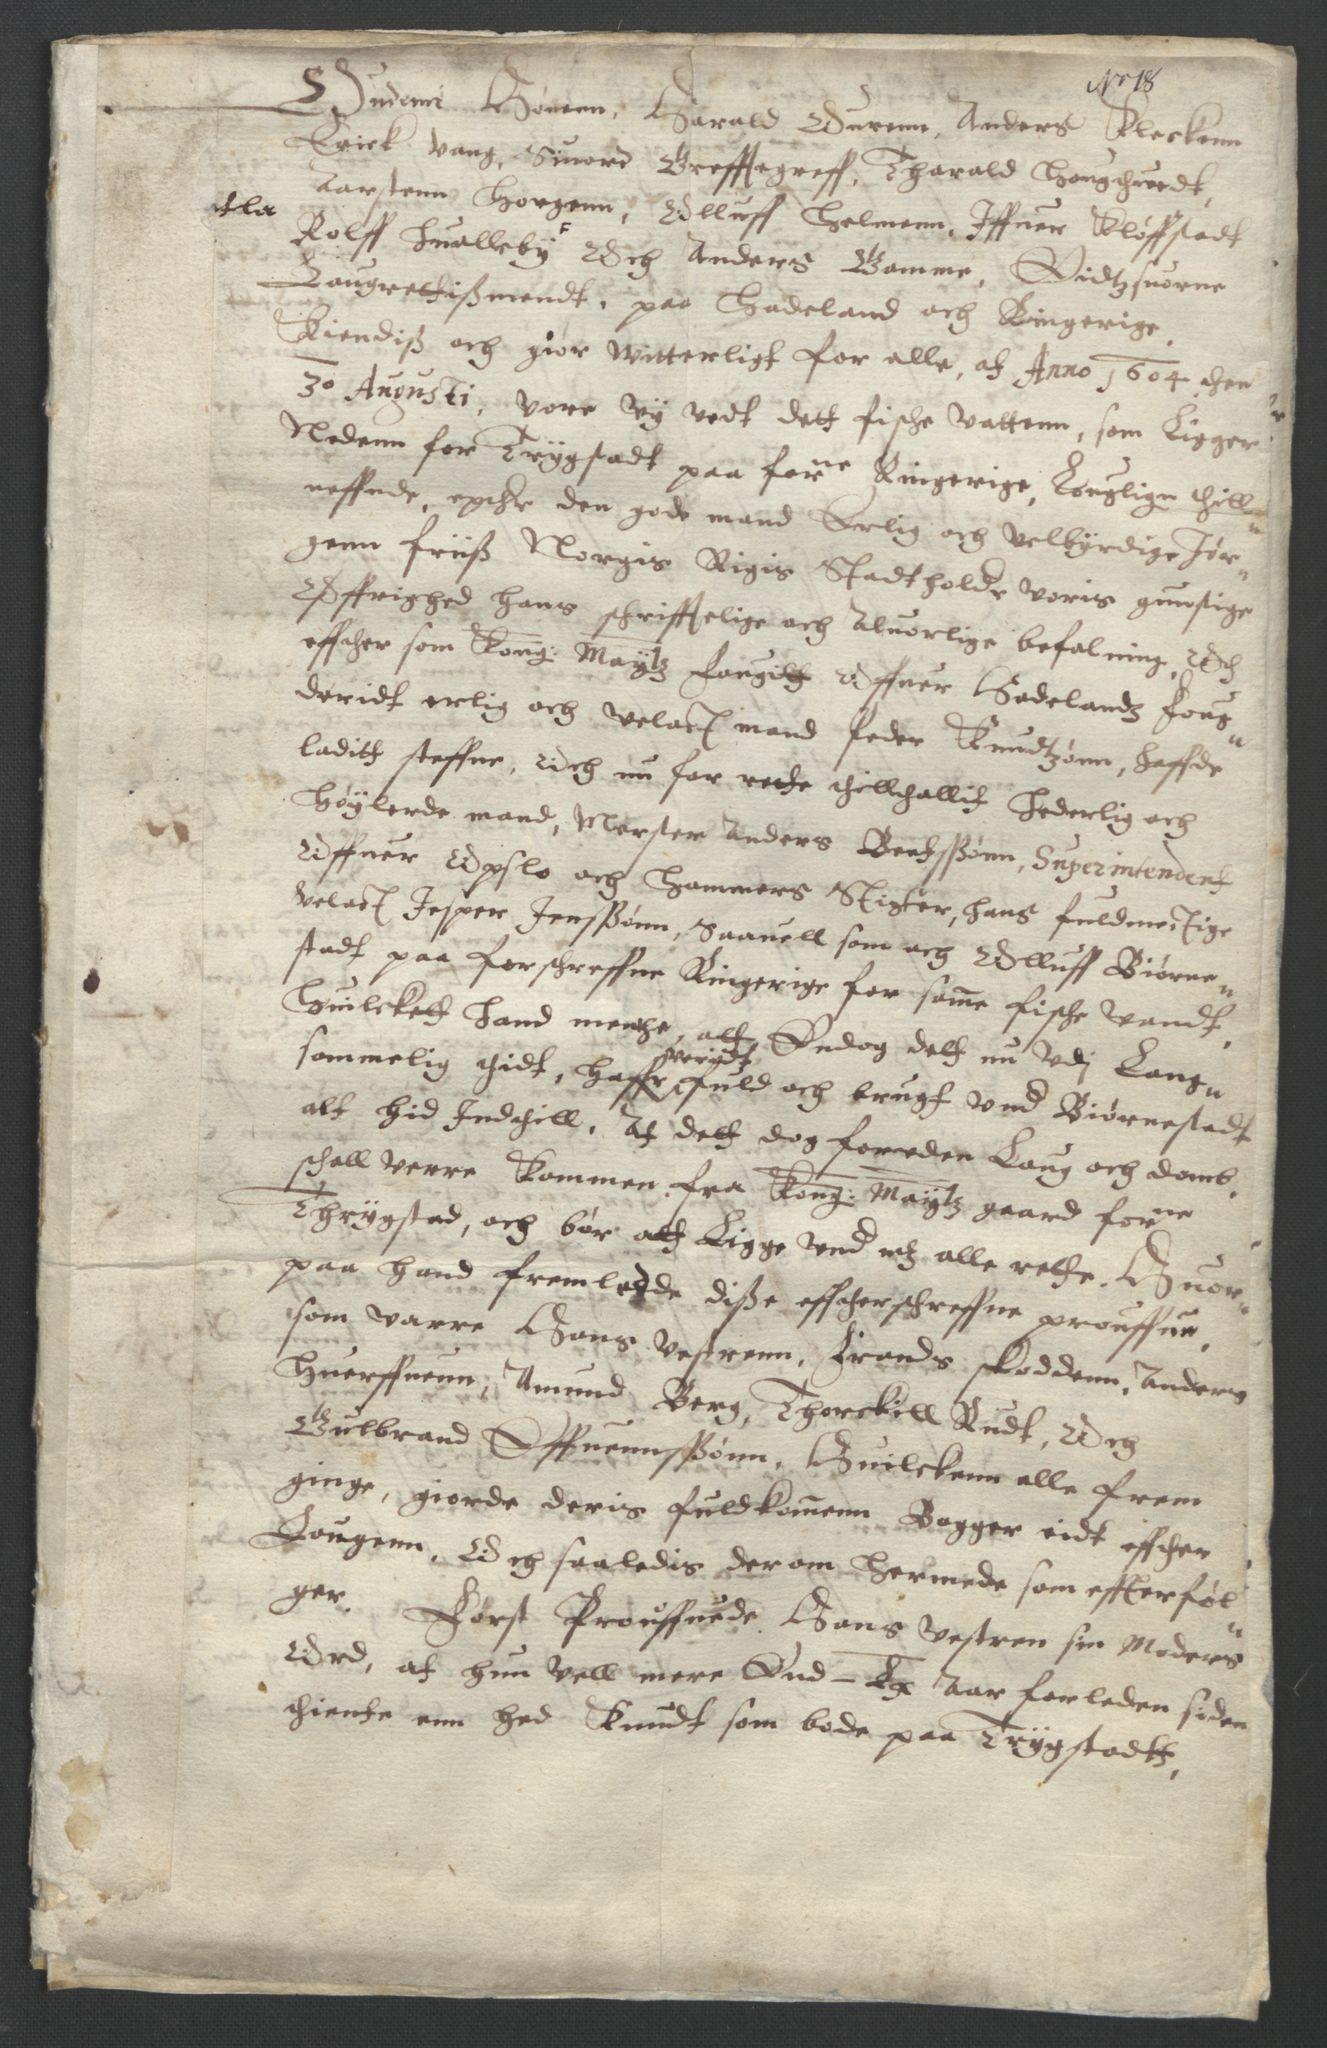 SAO, Oslo stiftsdireksjon, G/Gb/L0001: Bispestolens dokumenter, 1584-1612, s. 18